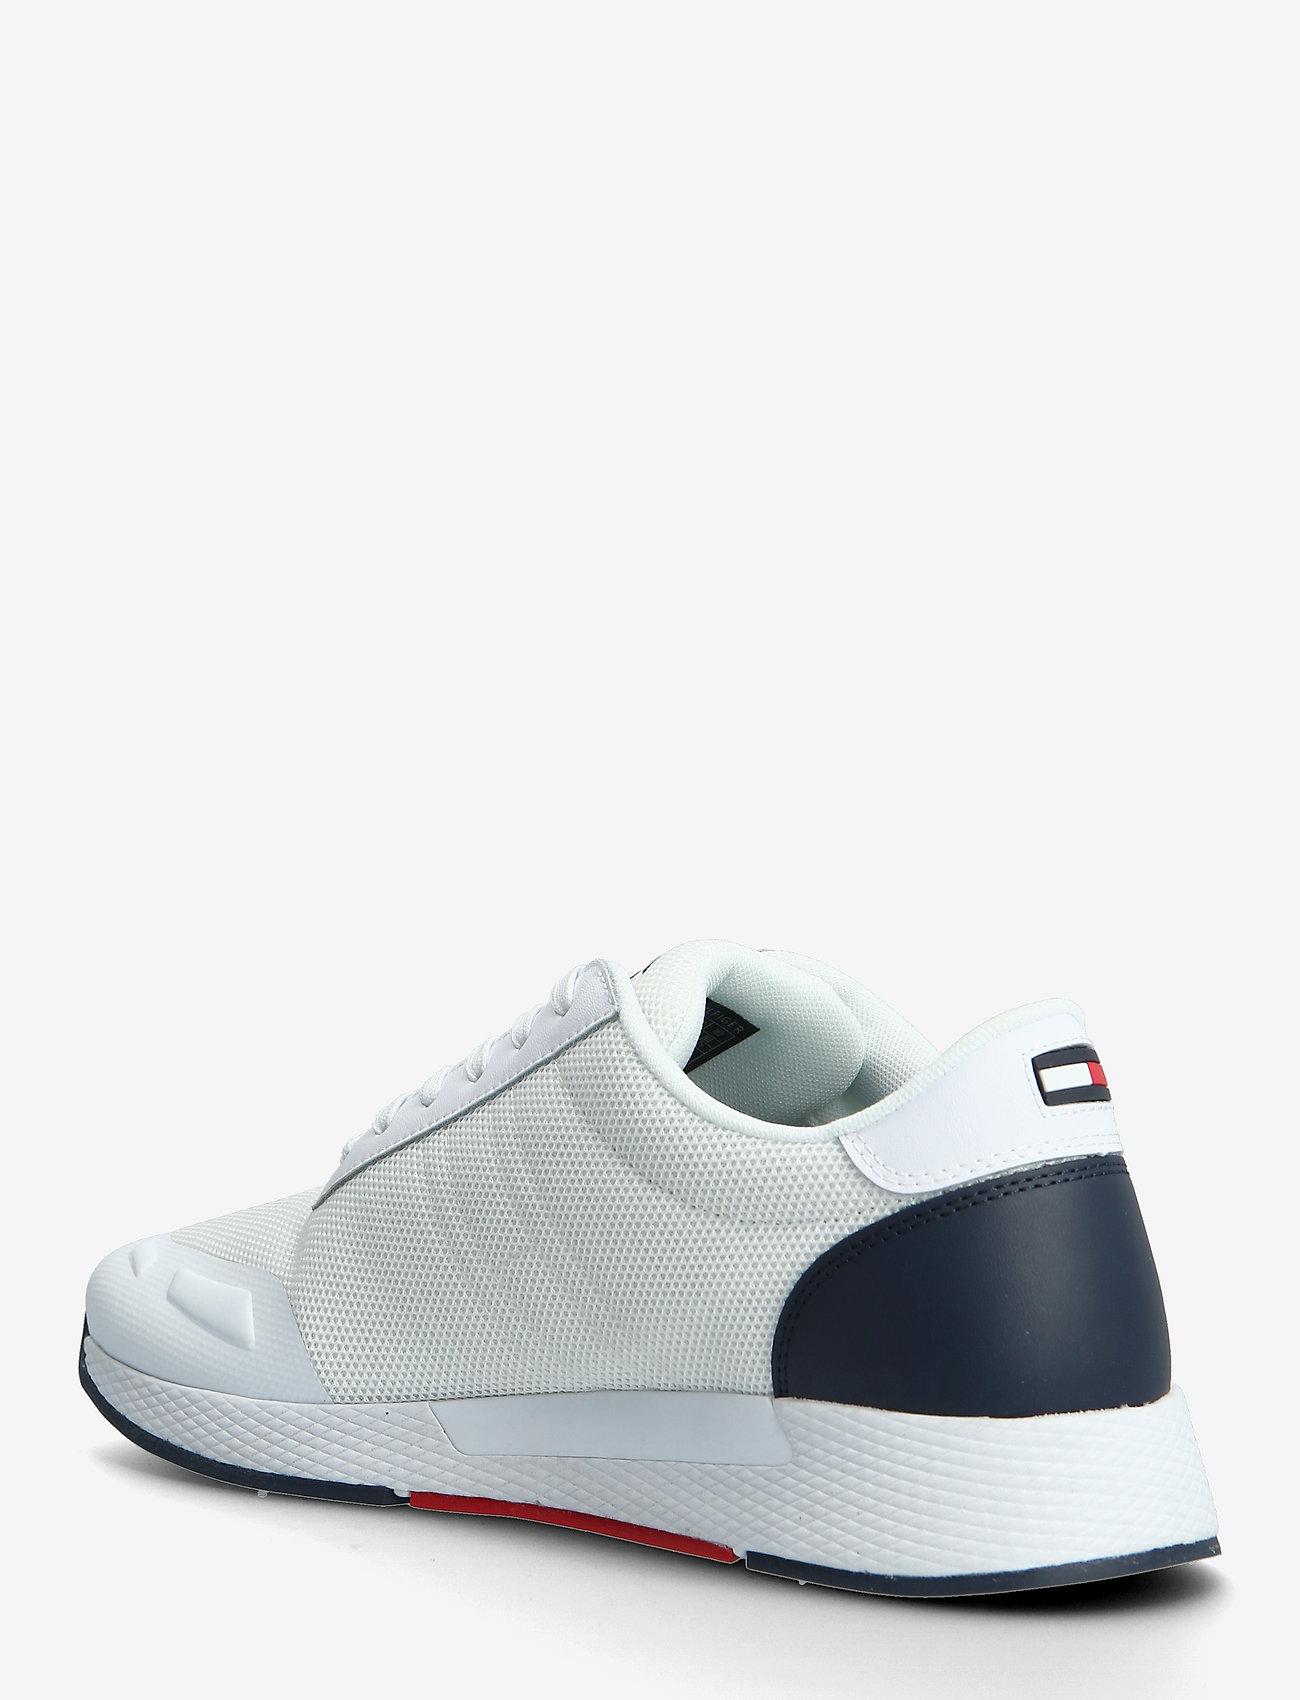 Tommy Hilfiger - FLEXI MESH TJM RUNNER - laag sneakers - white - 2